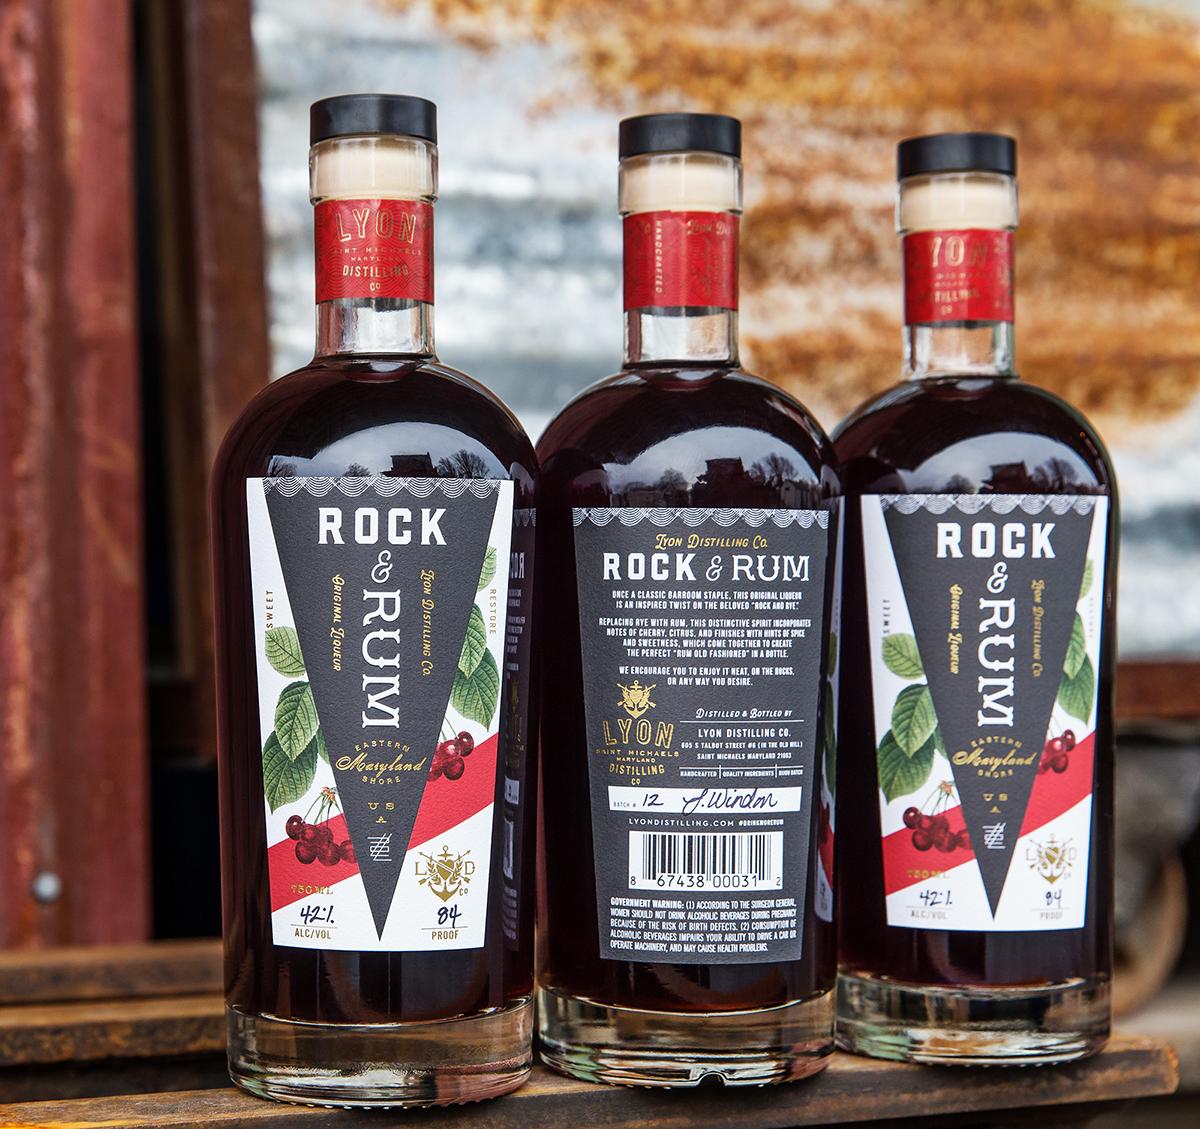 Rum Spirits liquor distilery logo bottle Label heart anchor arrows